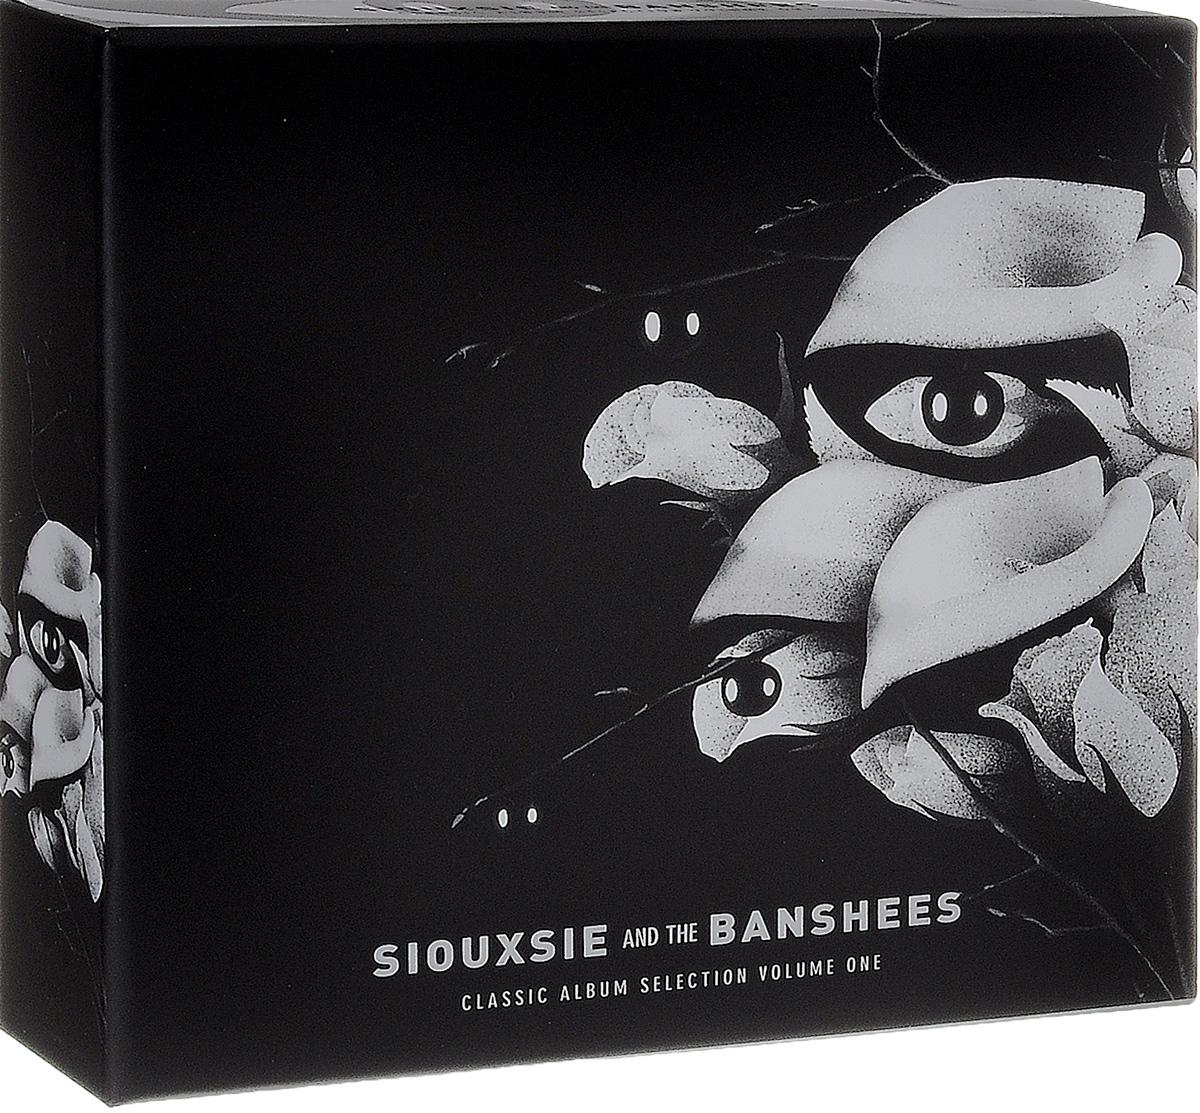 Siouxsie And The Banshees Siouxsie And The Banshees. Classic Album Selection. Volume 1 (6 CD) siouxsie and the banshees siouxsie and the banshees kaleidoscope